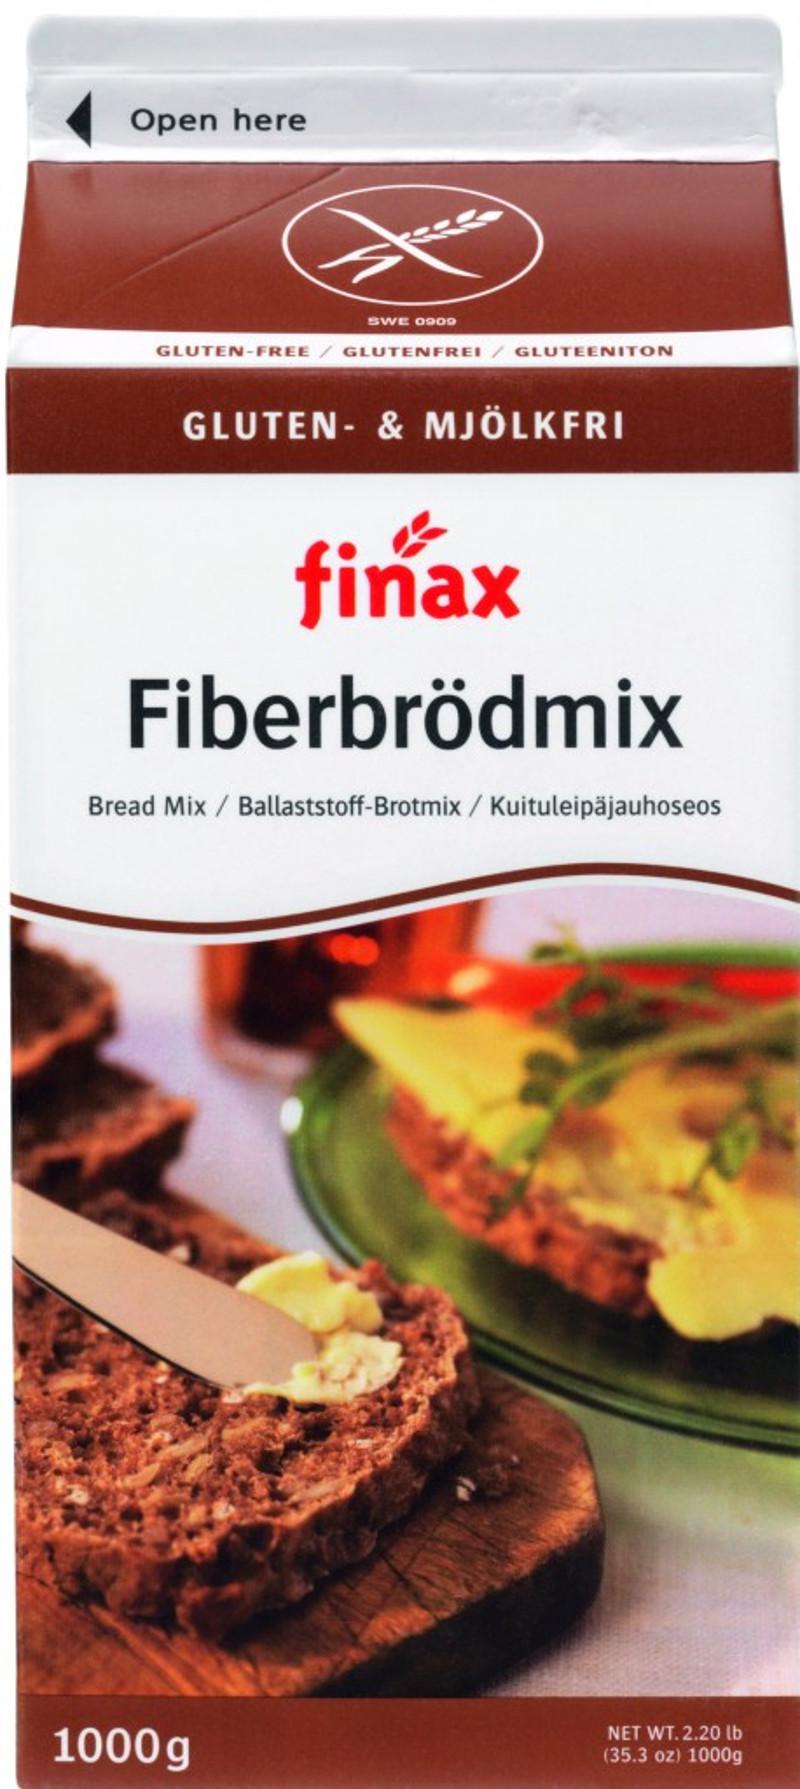 glutenfri-fiberbrodmix-458x1024.jpg